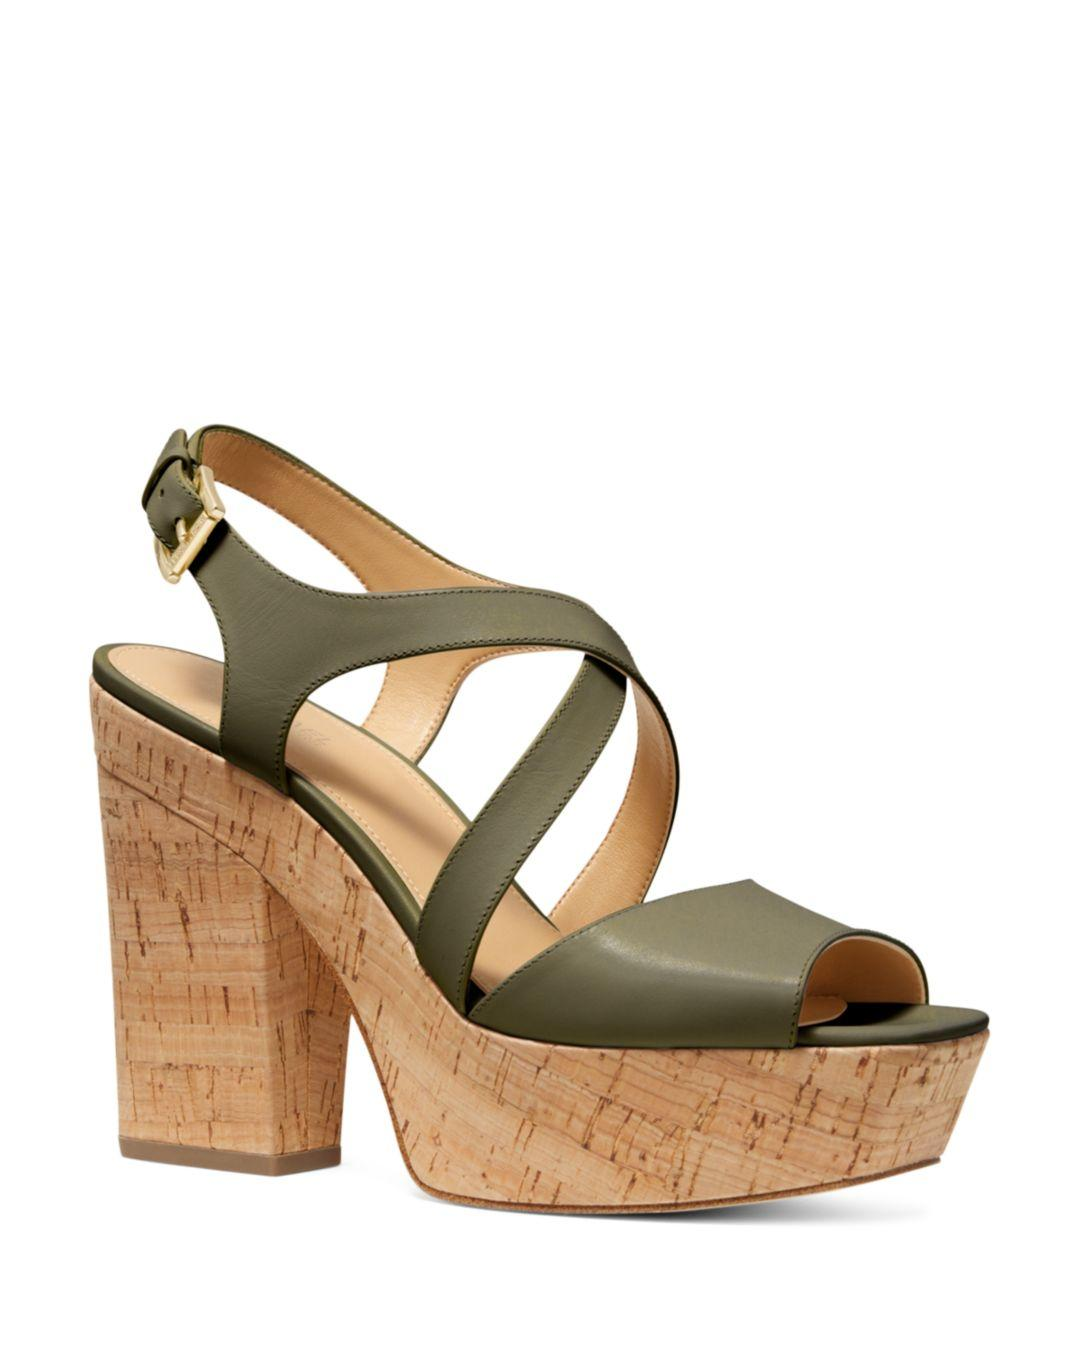 5d3c7bba390 MICHAEL Michael Kors. Green Women s Abbott Leather Platform Wedge Sandals